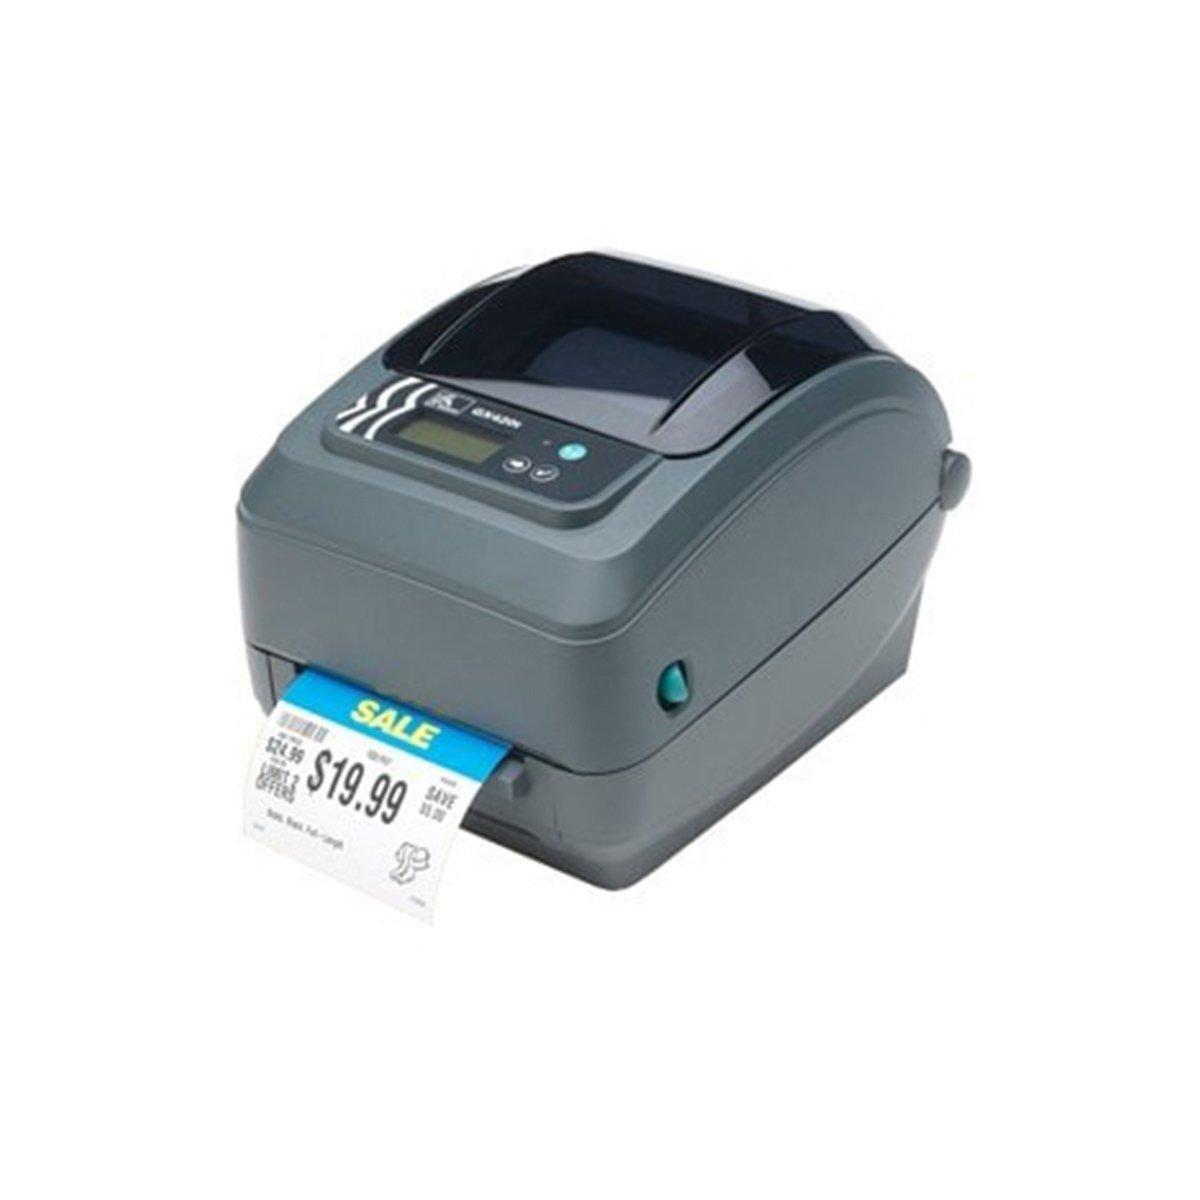 Impresora T 233 Rmica Zebra Gx420t Mundotpv